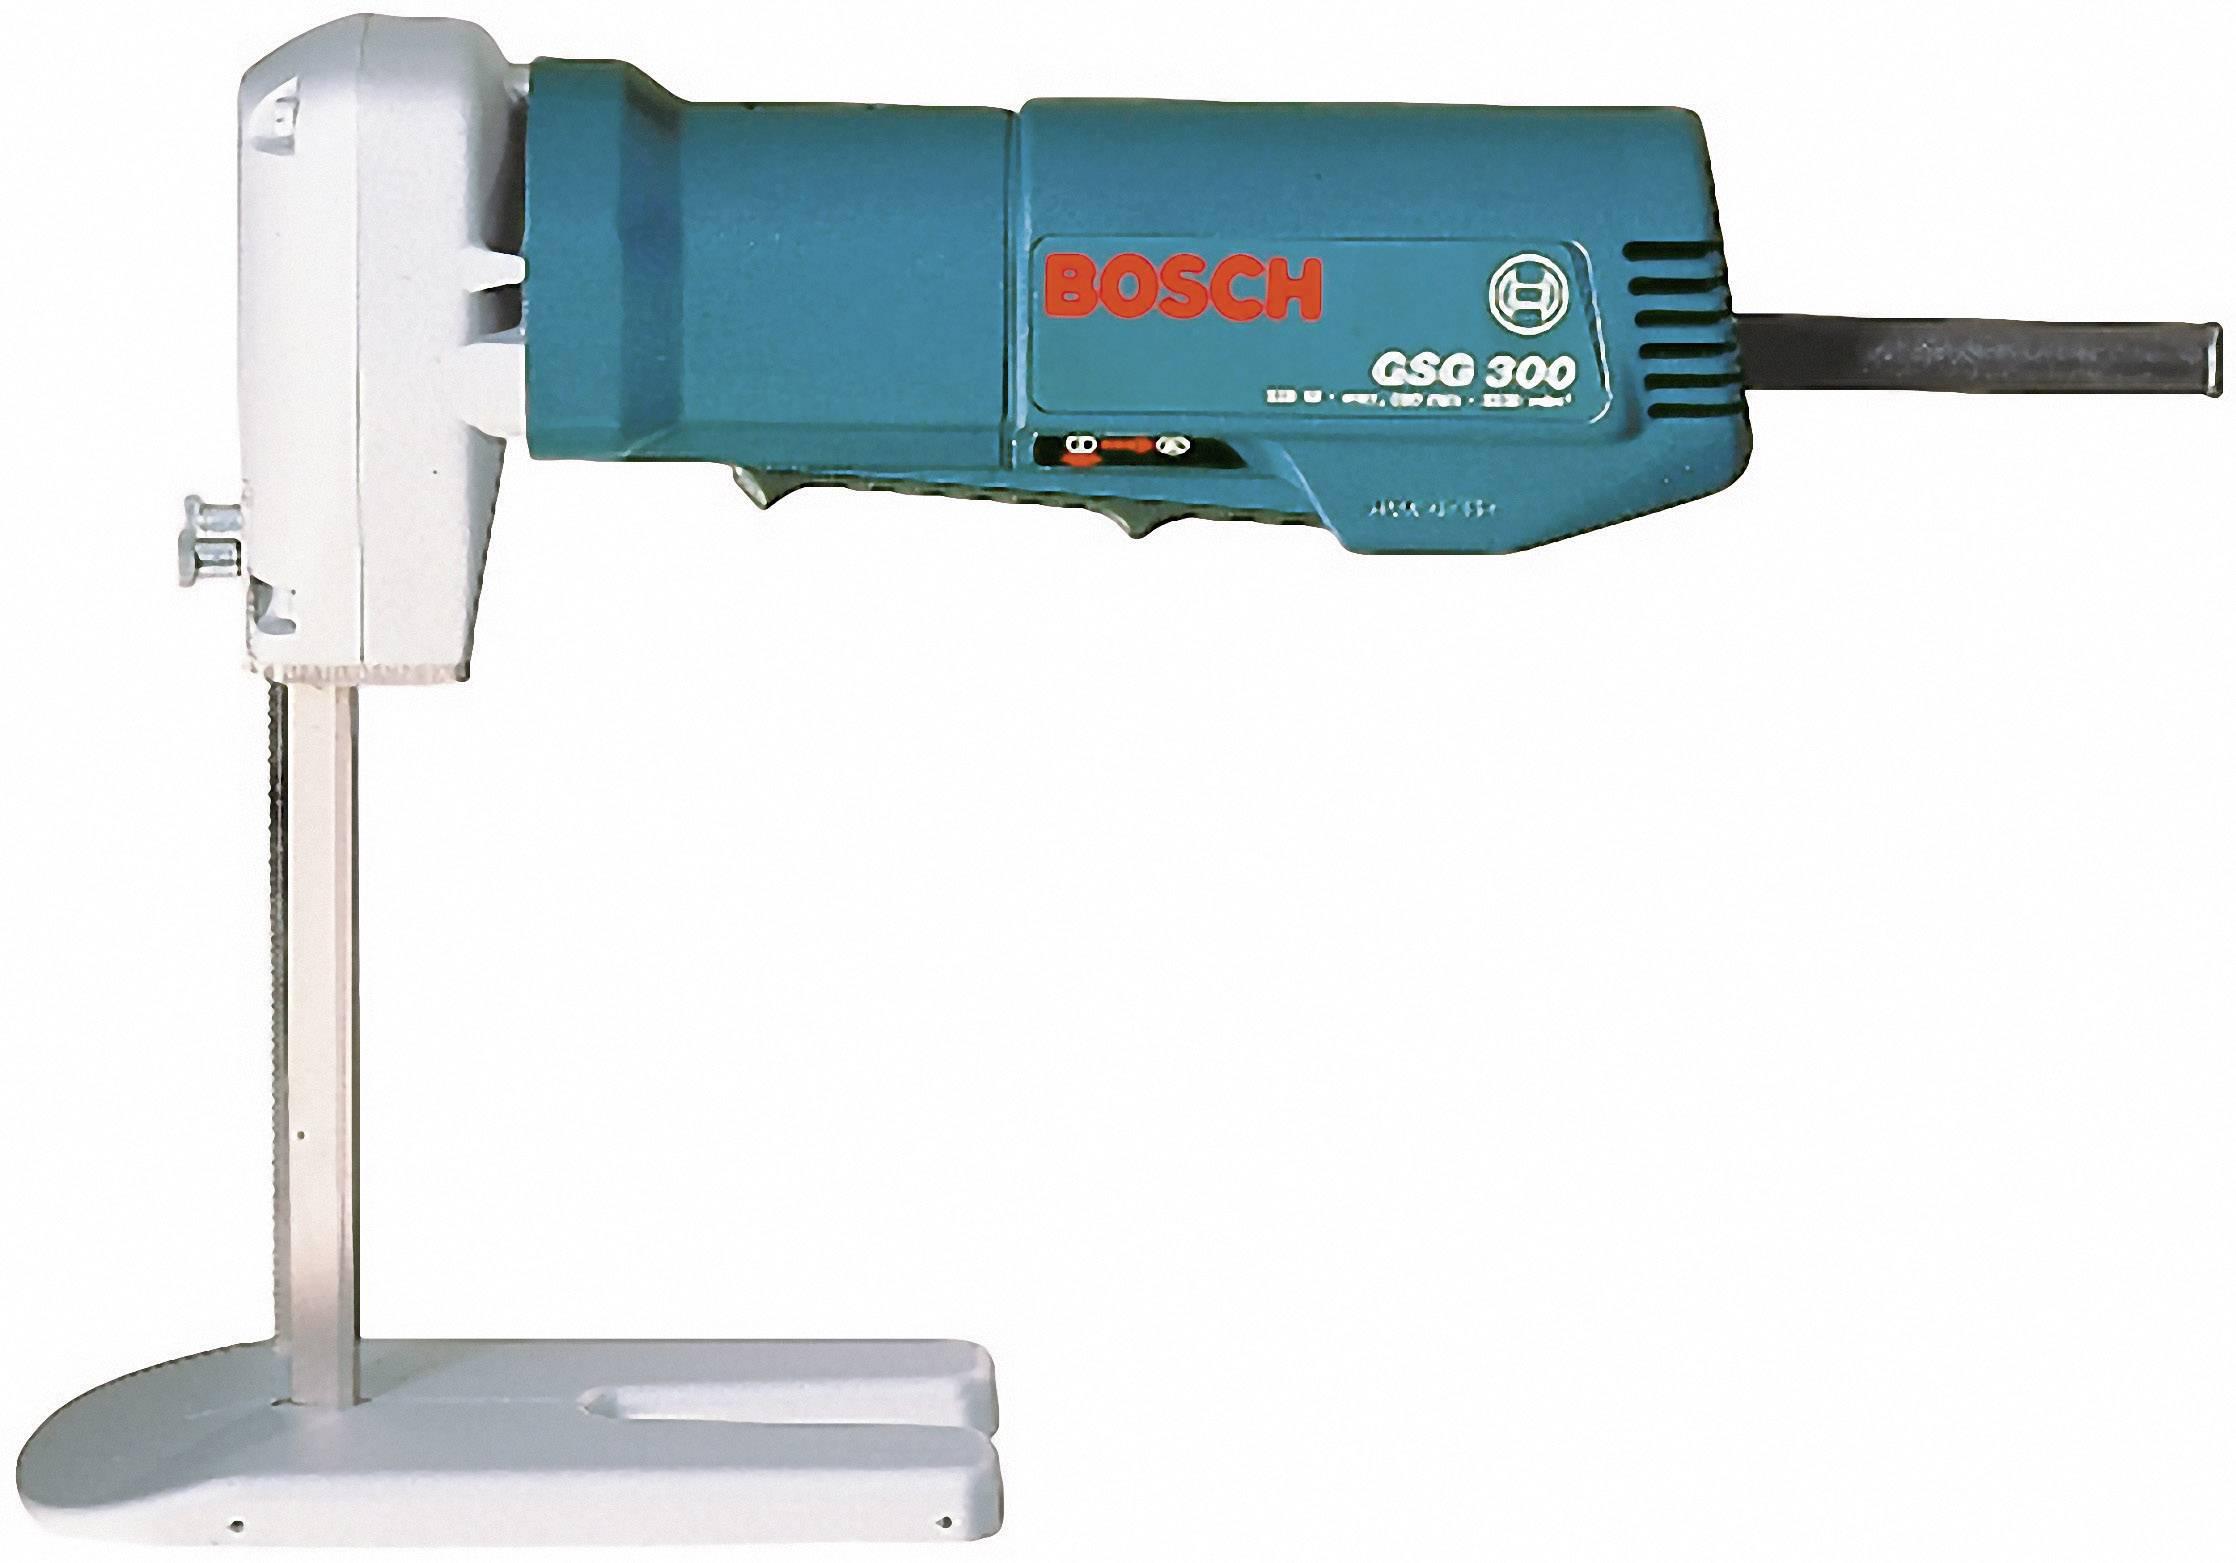 Píla na penové Bosch materiály GSG 300 0601575103